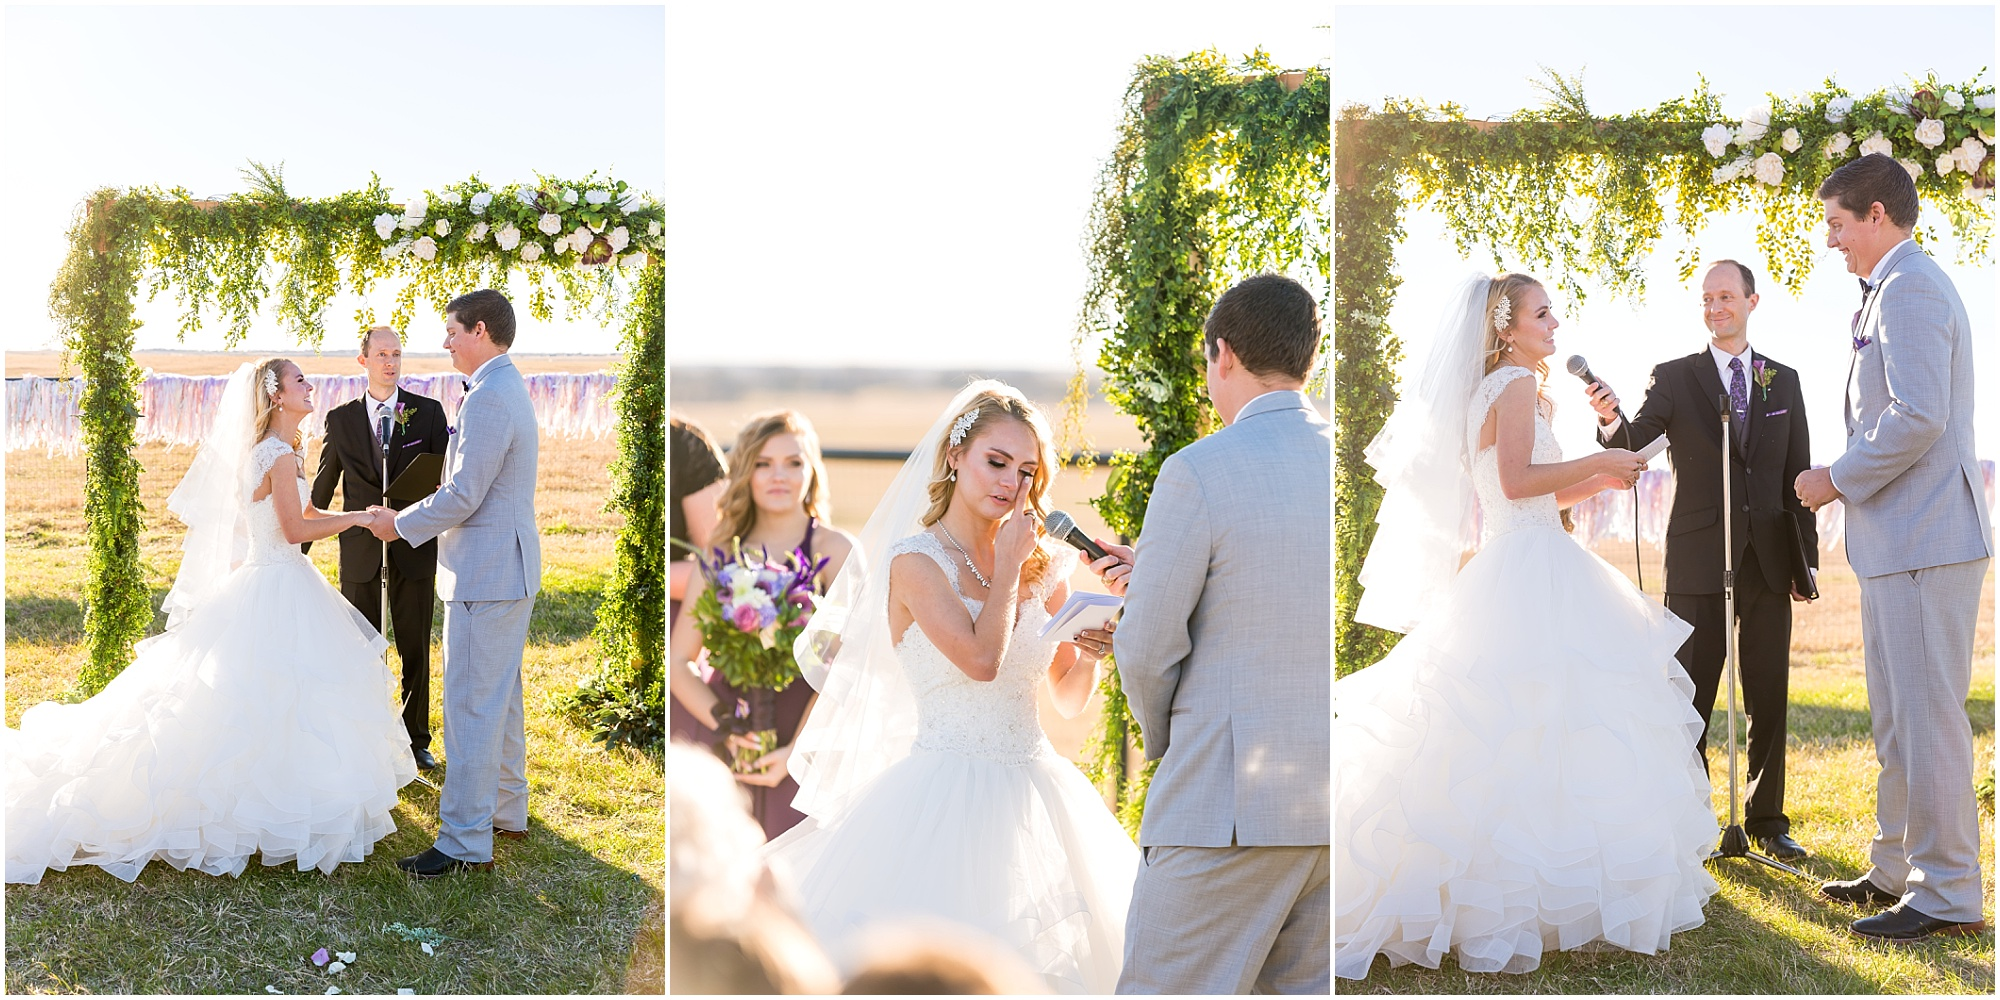 Disney-Inspired-Wedding-Central-Texas_0040.jpg